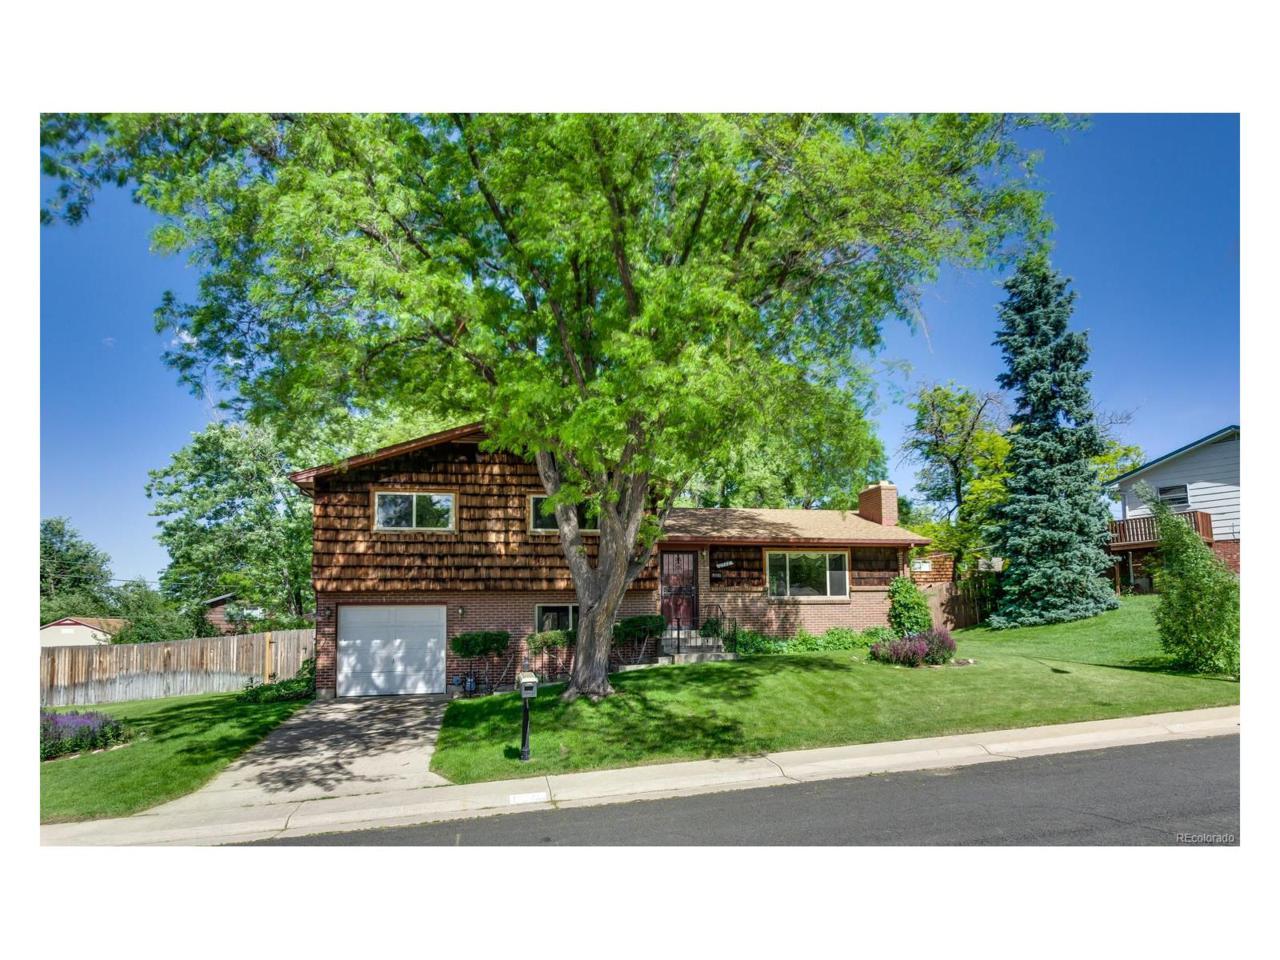 10546 Pompey Way, Northglenn, CO 80234 (MLS #5686895) :: 8z Real Estate